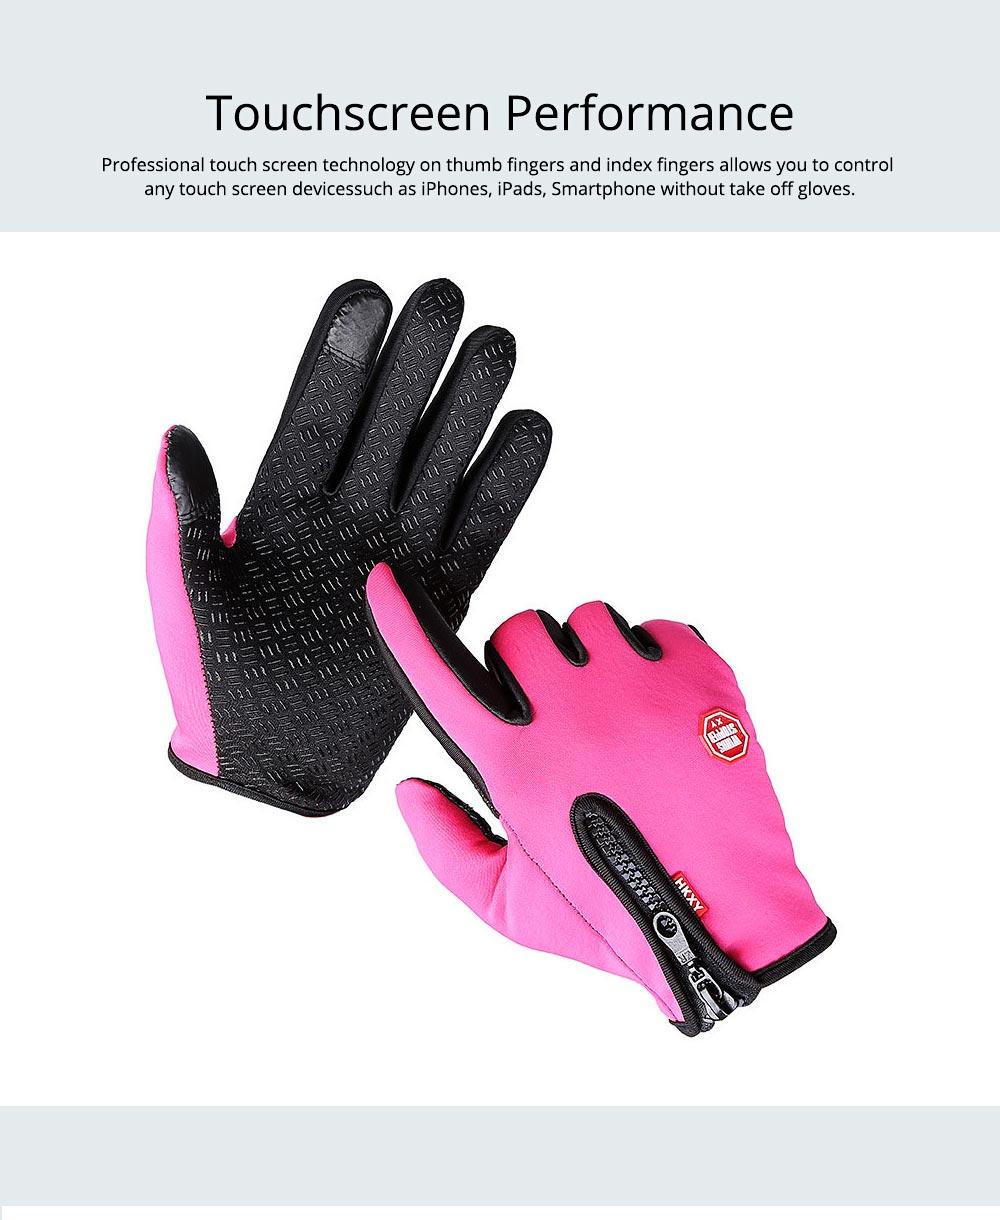 Winter Gloves PU Warm Waterproof Anti-skid Touchscreen Zipper Gloves for Running Hiking Climbing Skiing for Men Women 5